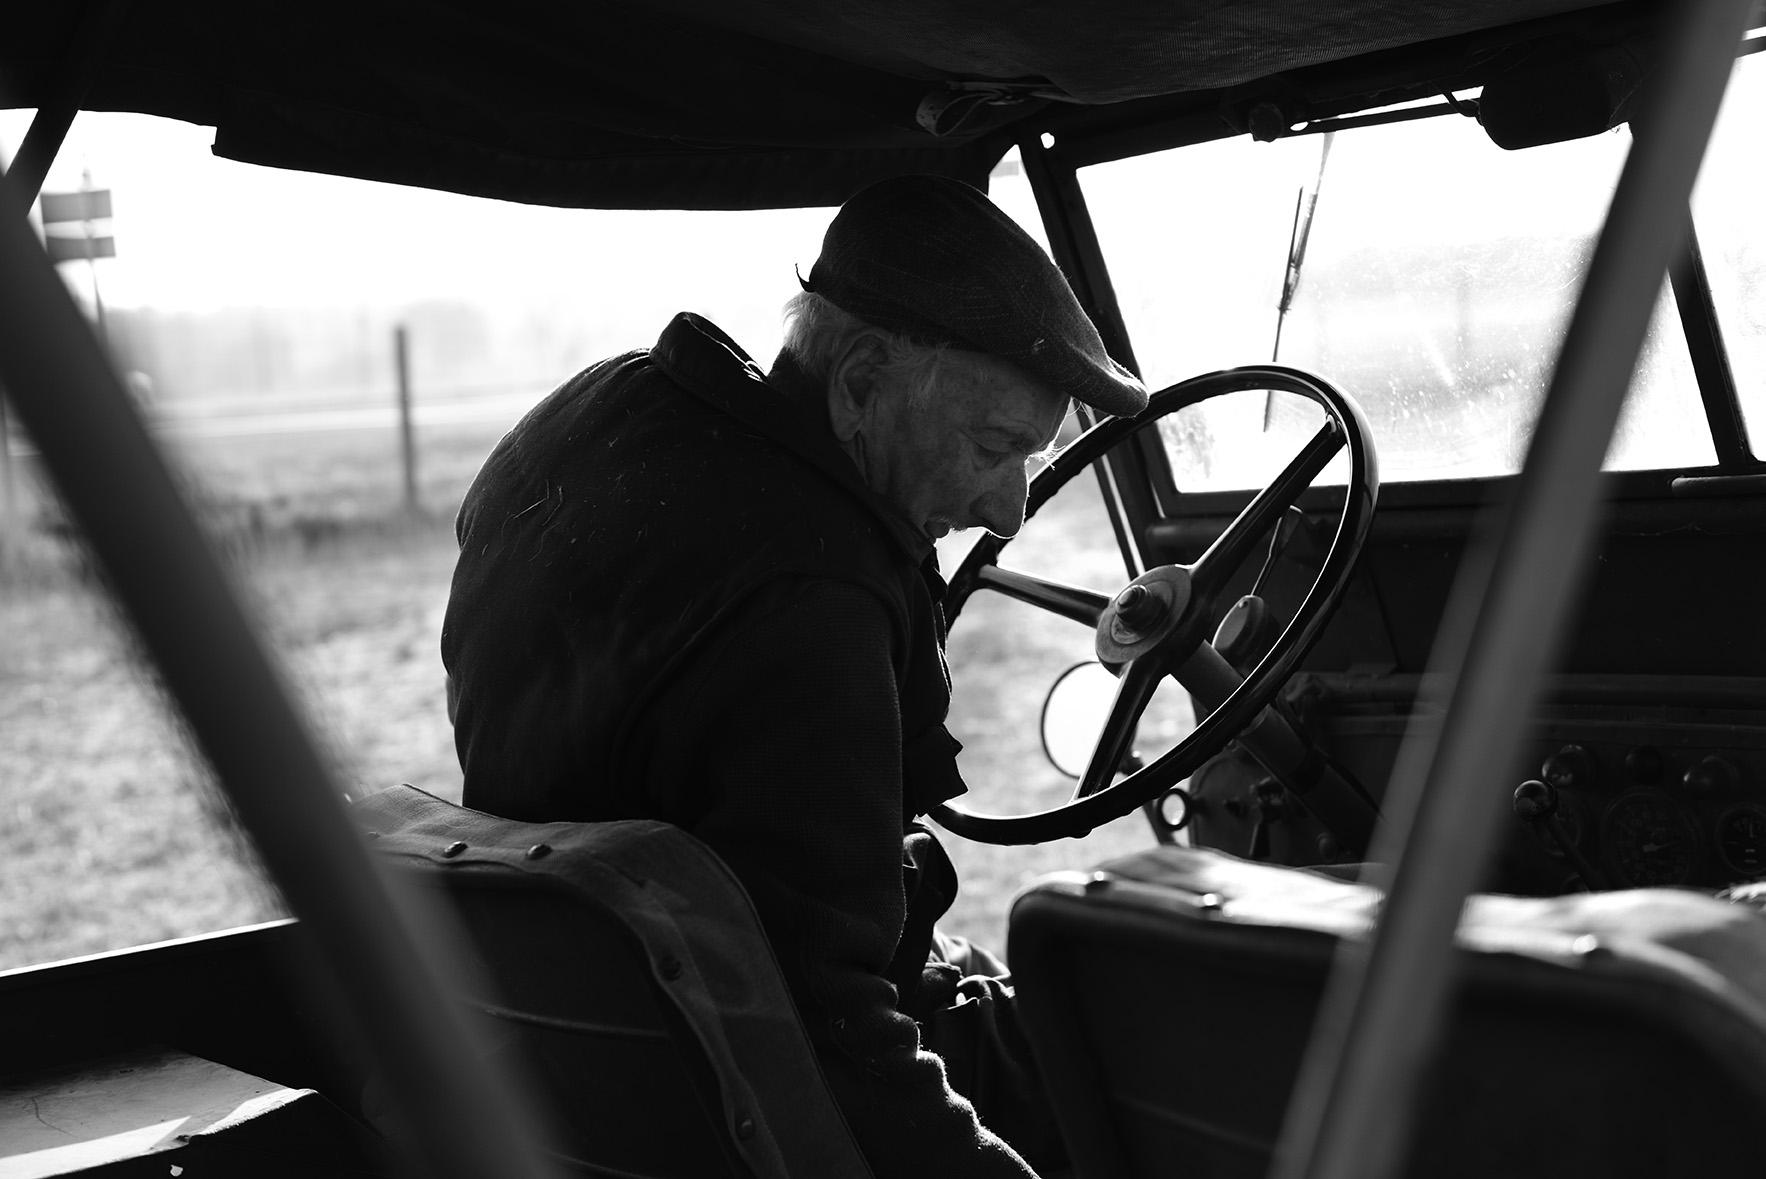 Charney Magri A French farmers secret to longevity 4168 LR